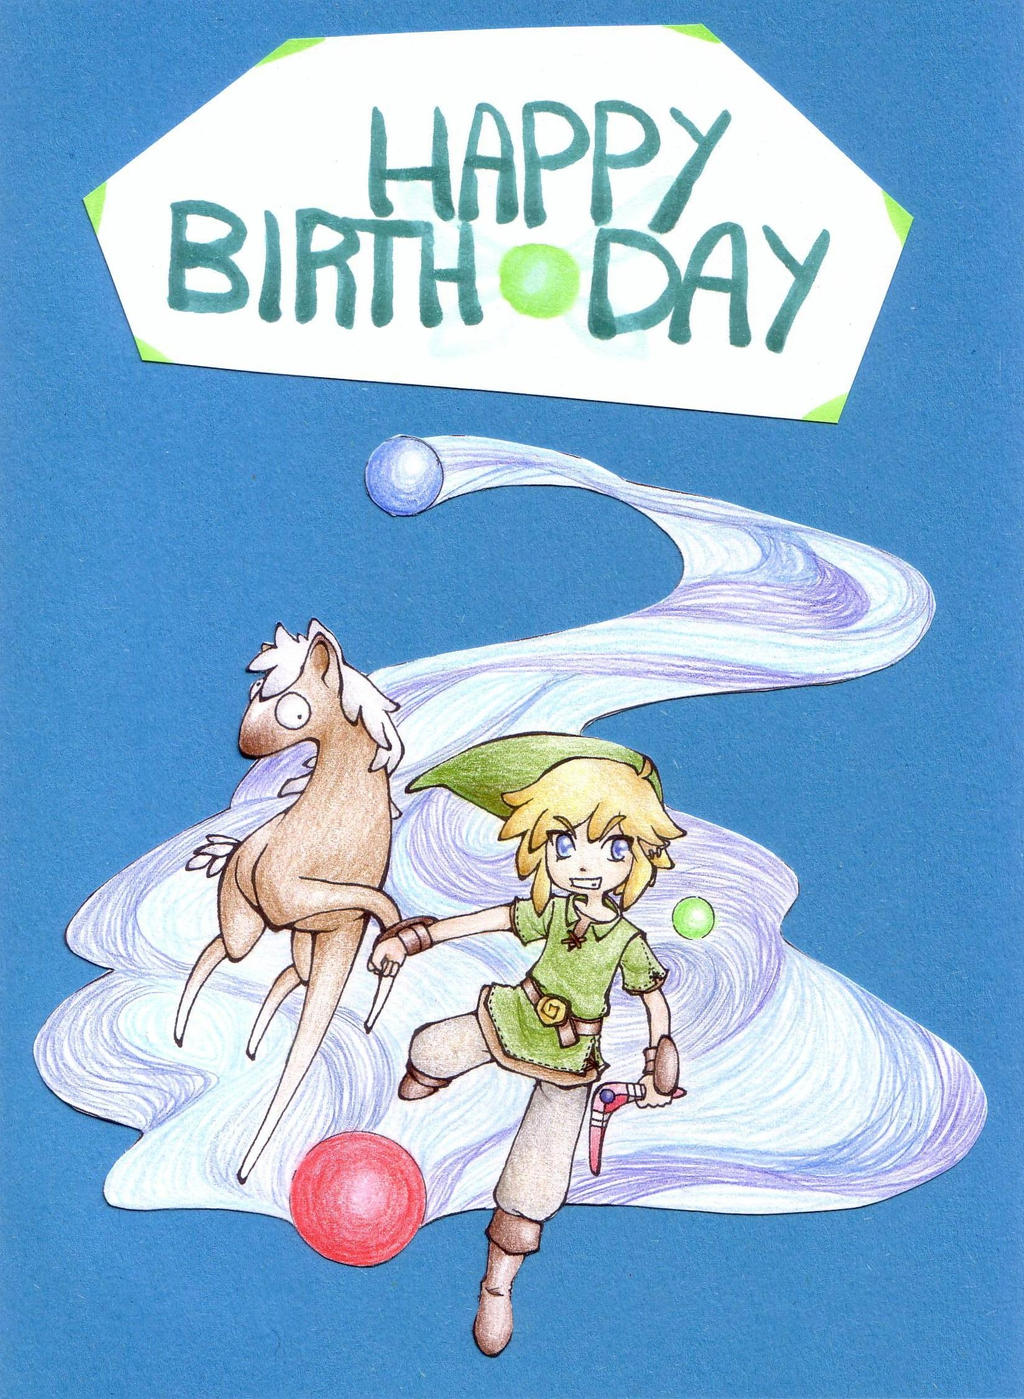 deviantart more like the legend of zelda  birthday card by leoloum, Birthday card